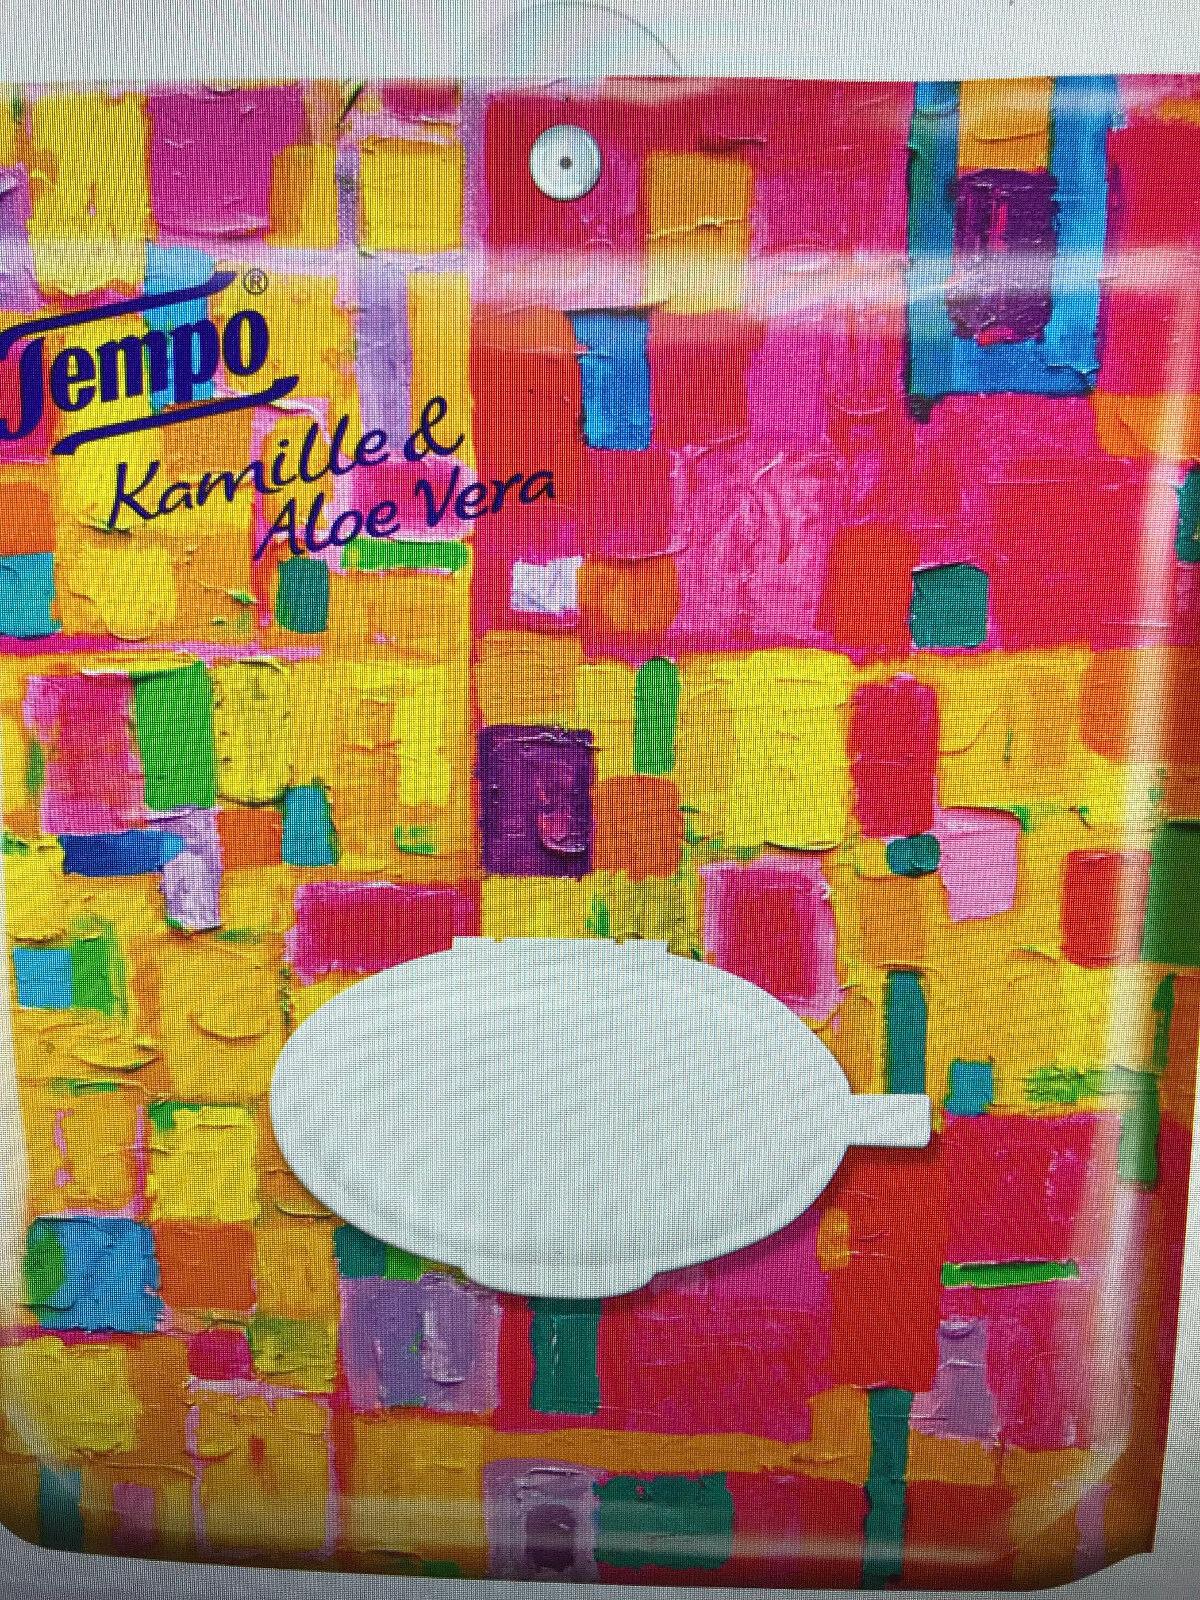 Tempo Feuchtes Toilettenpapier Kamille & Aloe Vera 1-lagig  6 Komfortbeutel